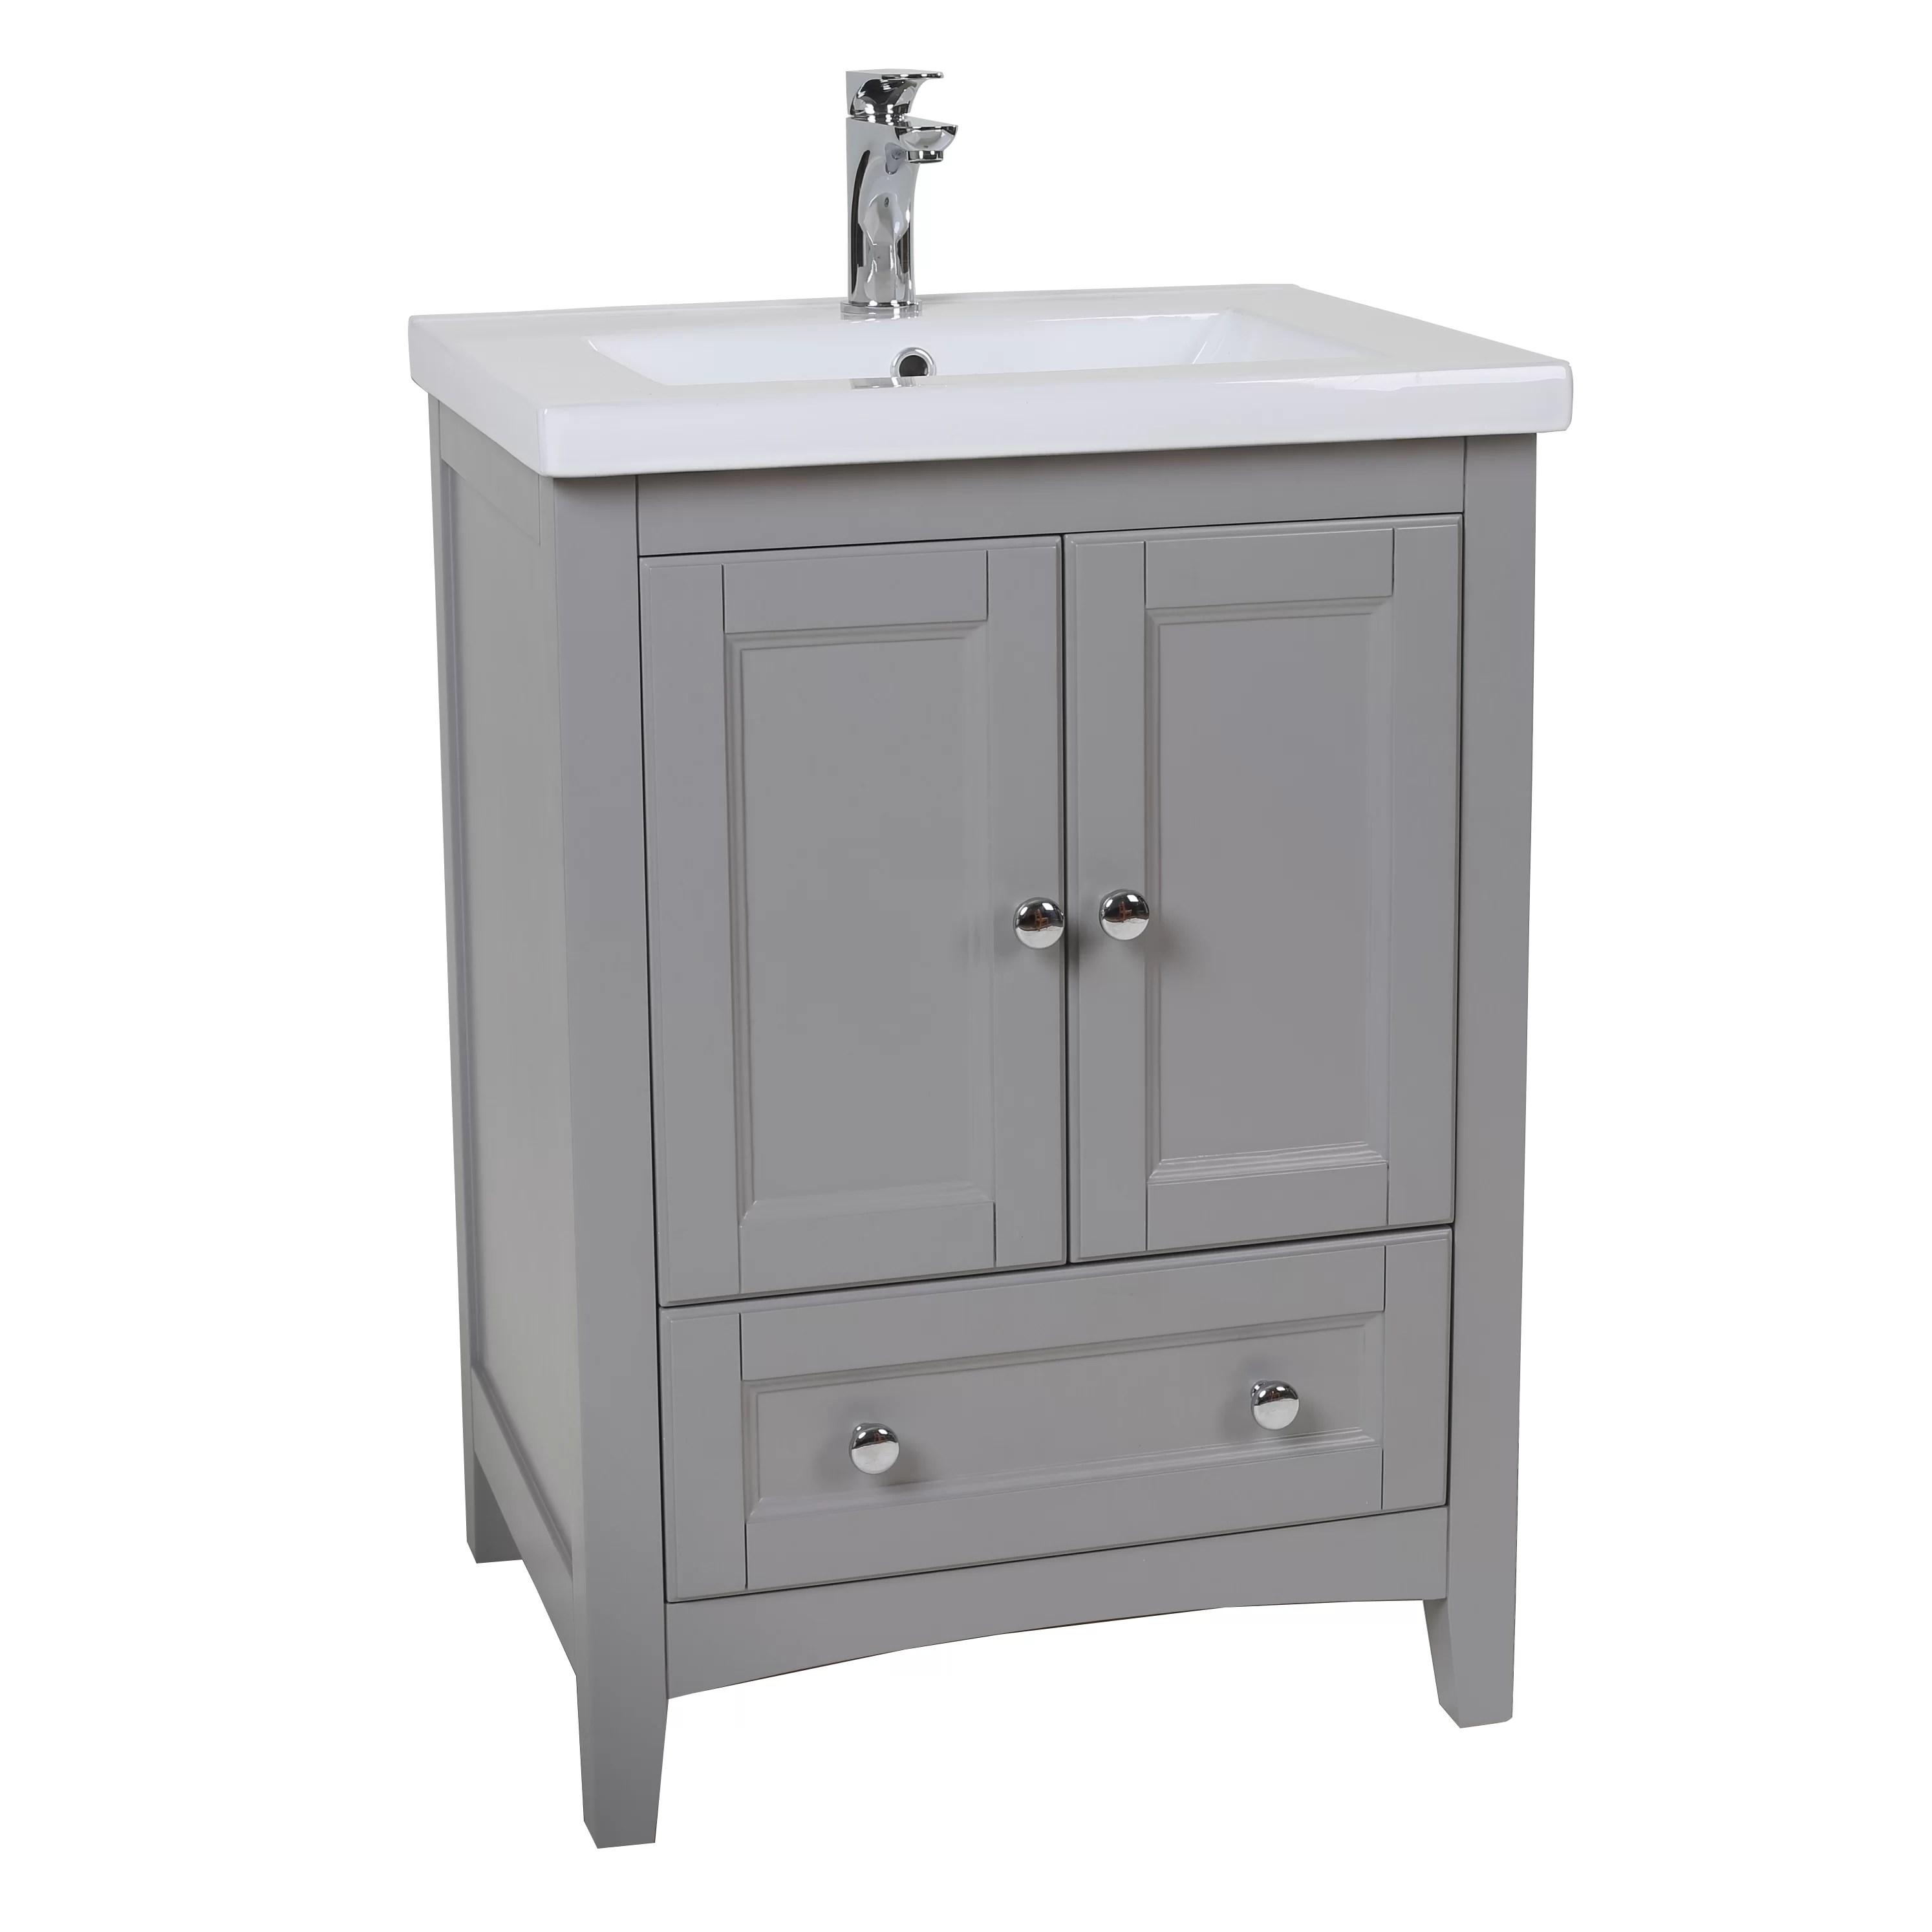 Elegant Lighting Danville 24 Single Bathroom Vanity Set